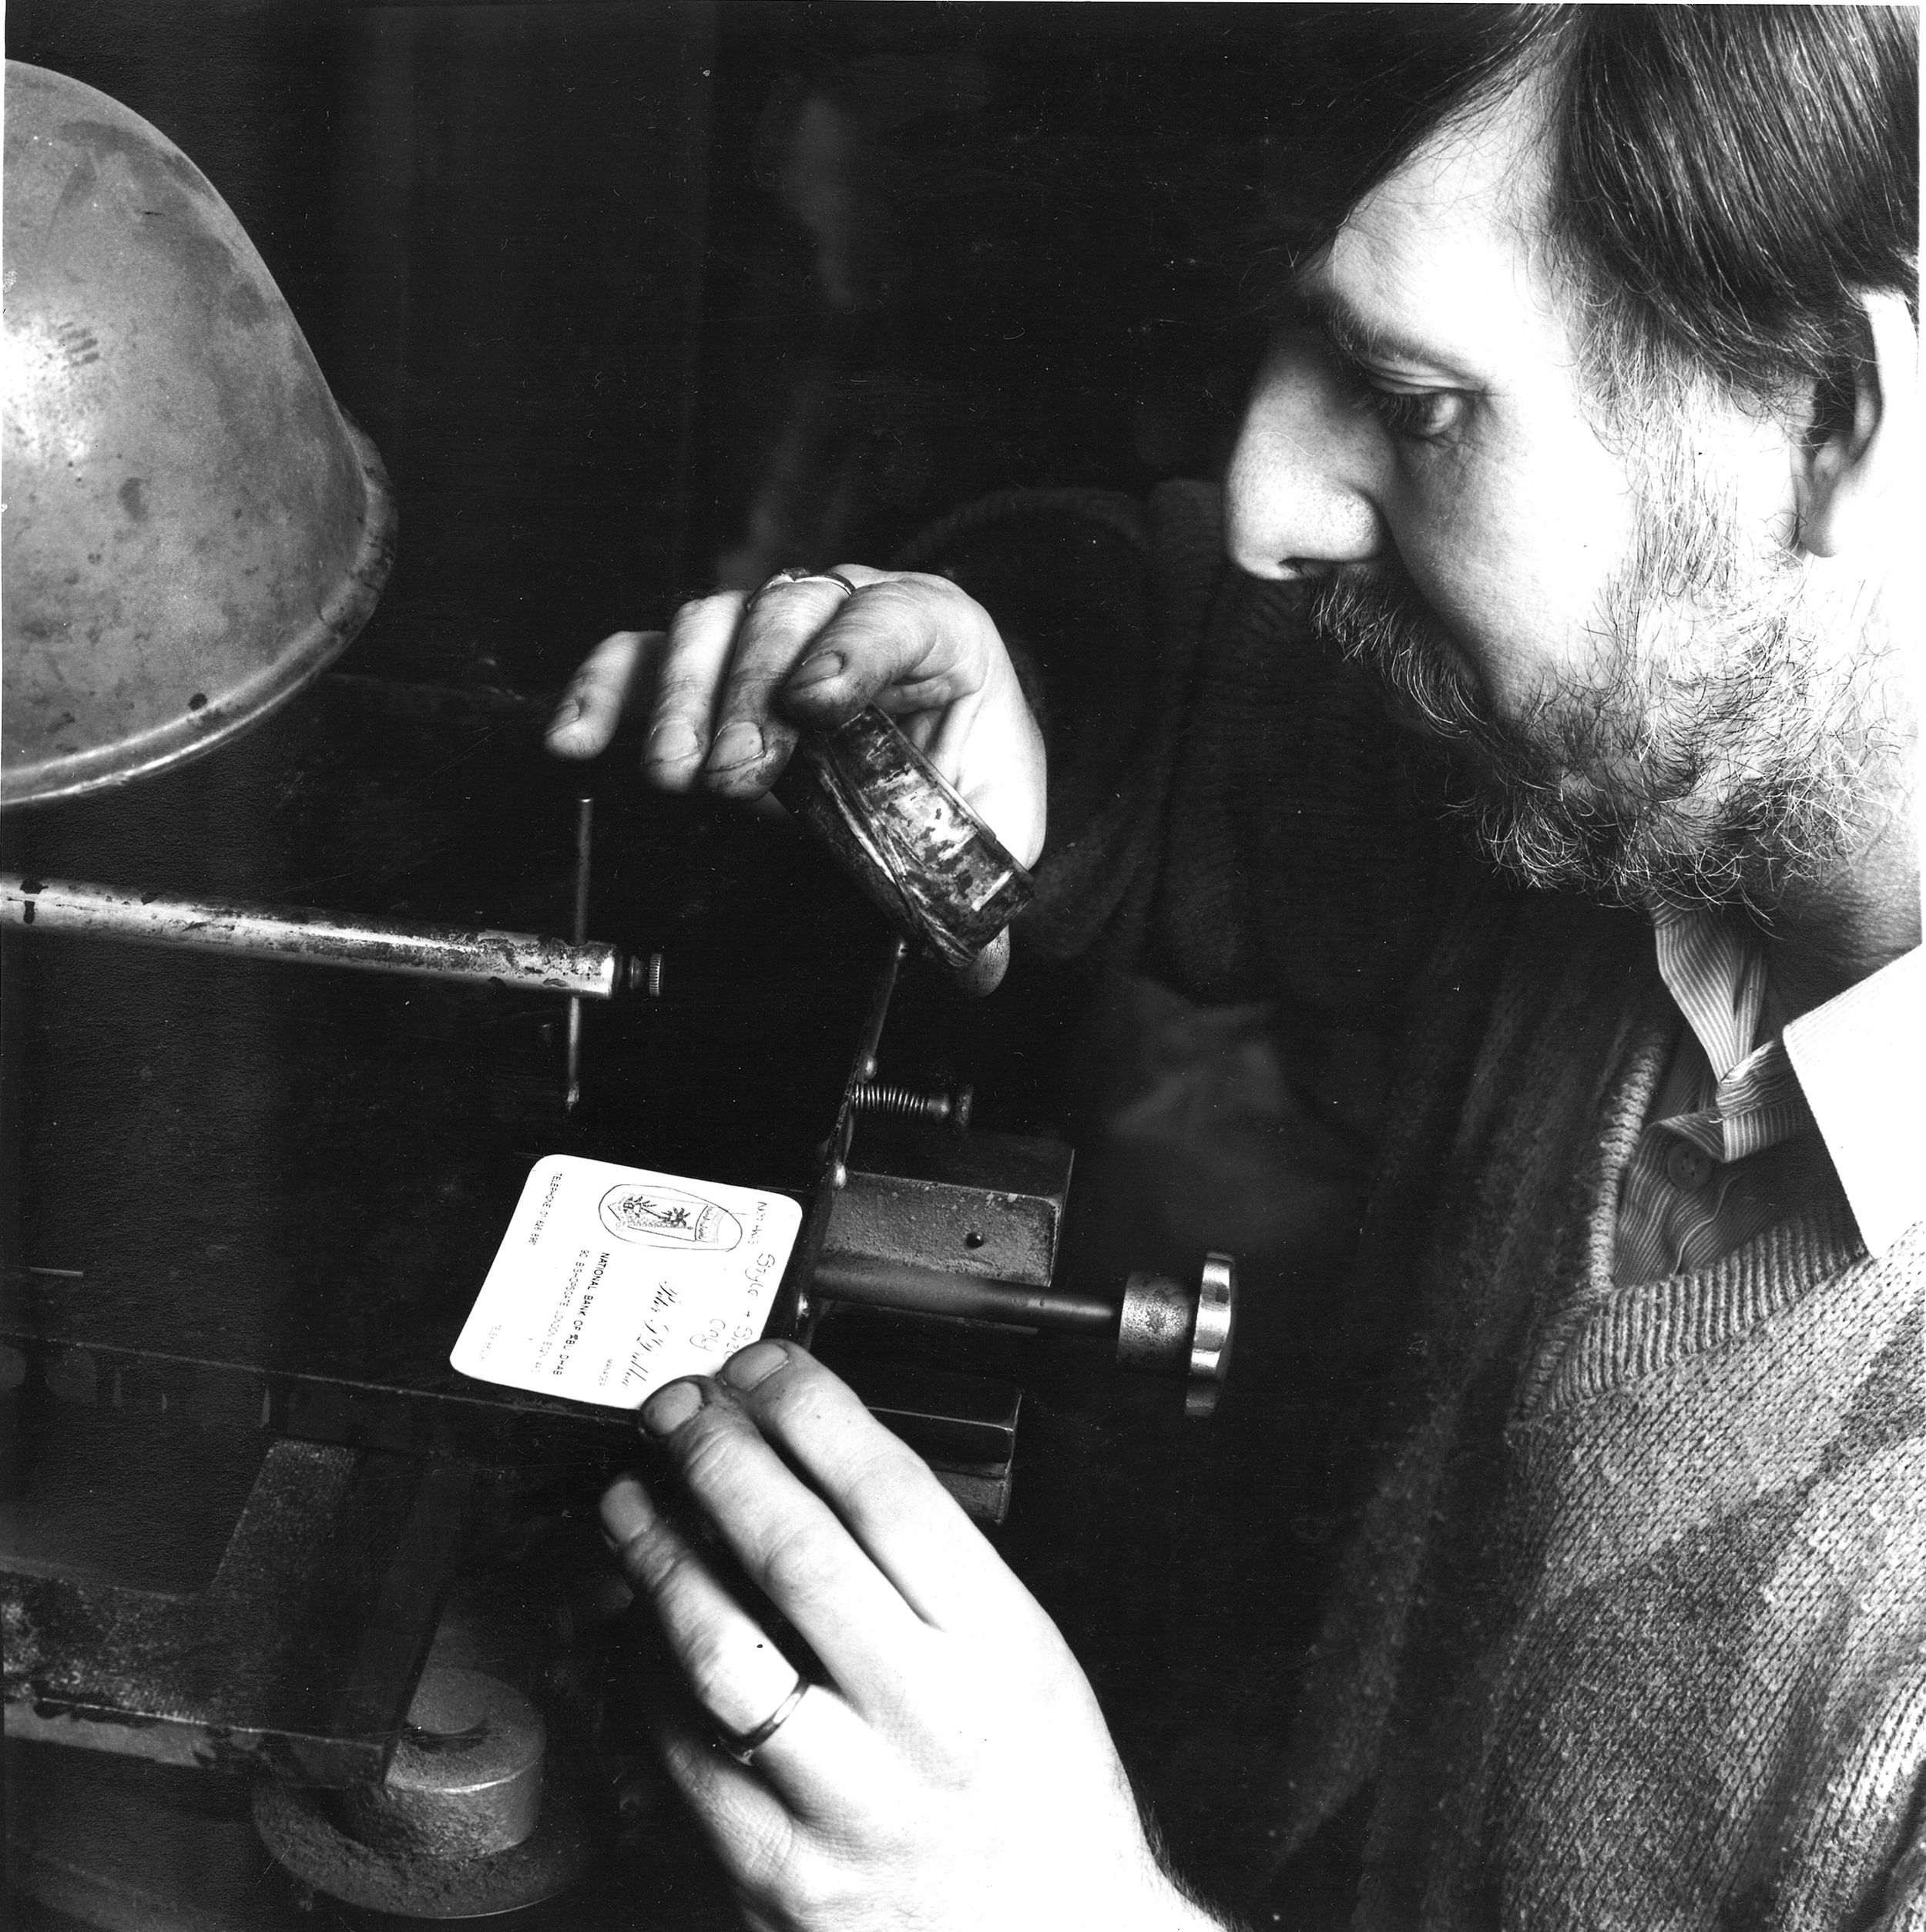 Man looking at printed card through magnifying glass